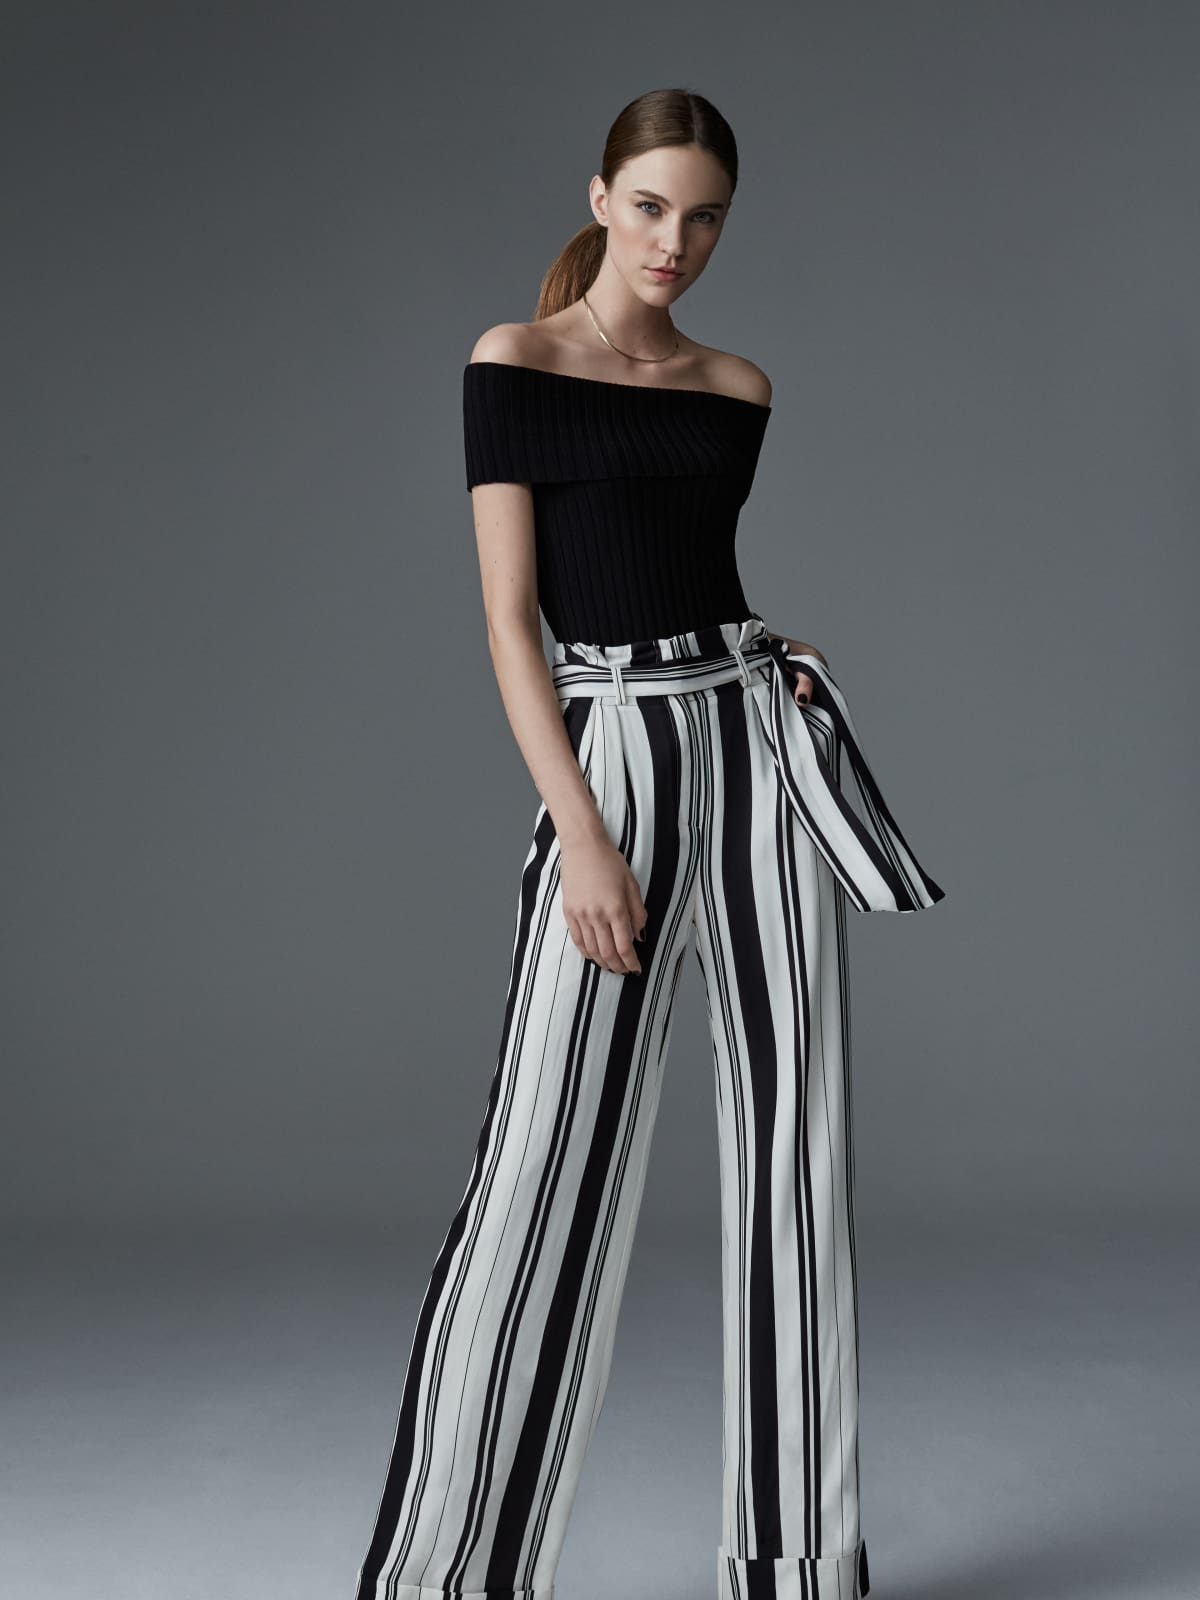 Olivia Palermo + Chelsea28 stripe wide leg pant and off shoulder blouse at Nordstrom